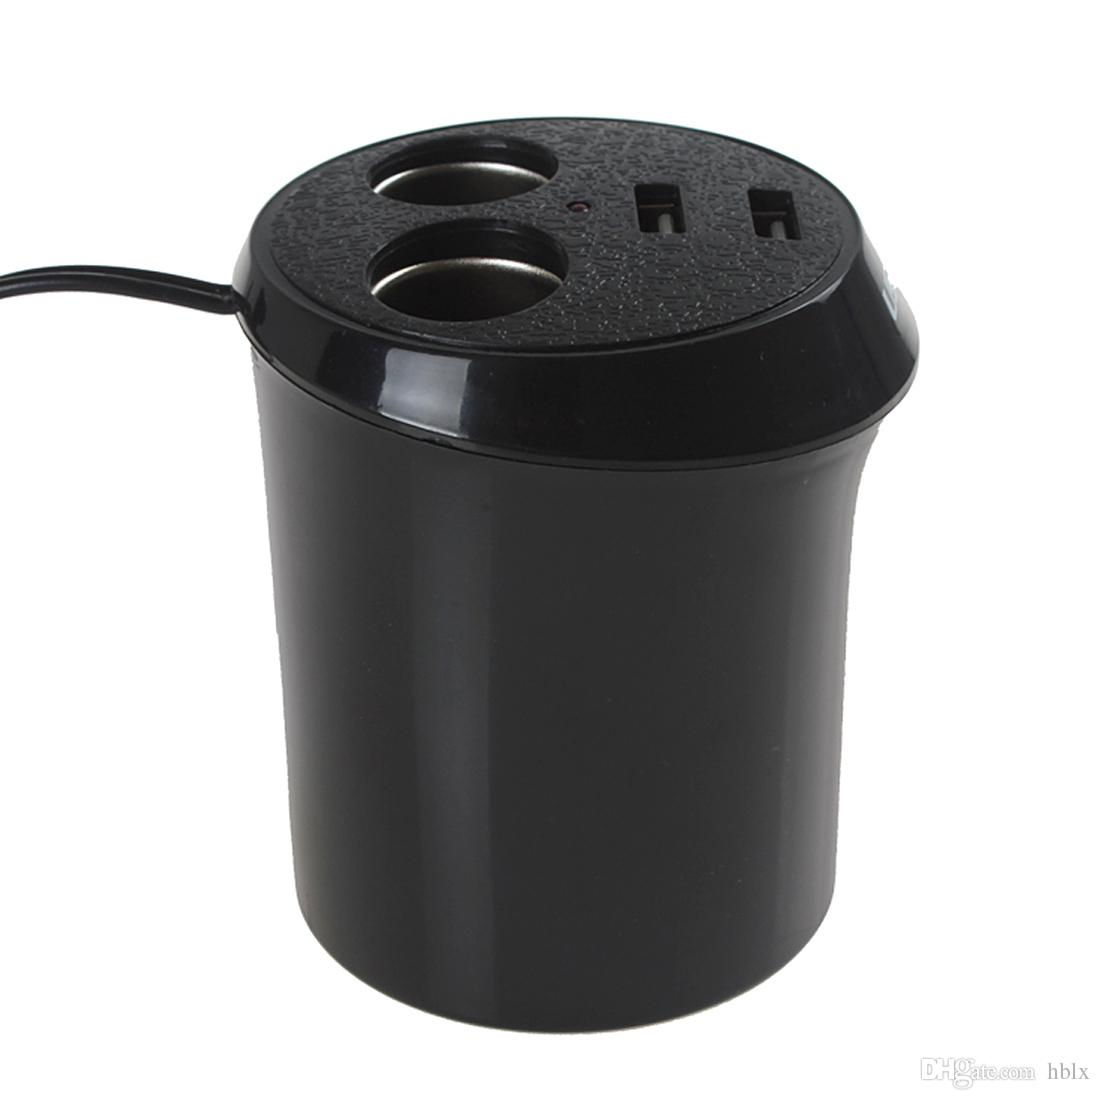 Universal Black Dual 12V USB Port 2 Sockets Car Cigarette Lighter Charger Power Adapter Splitter CEC_619